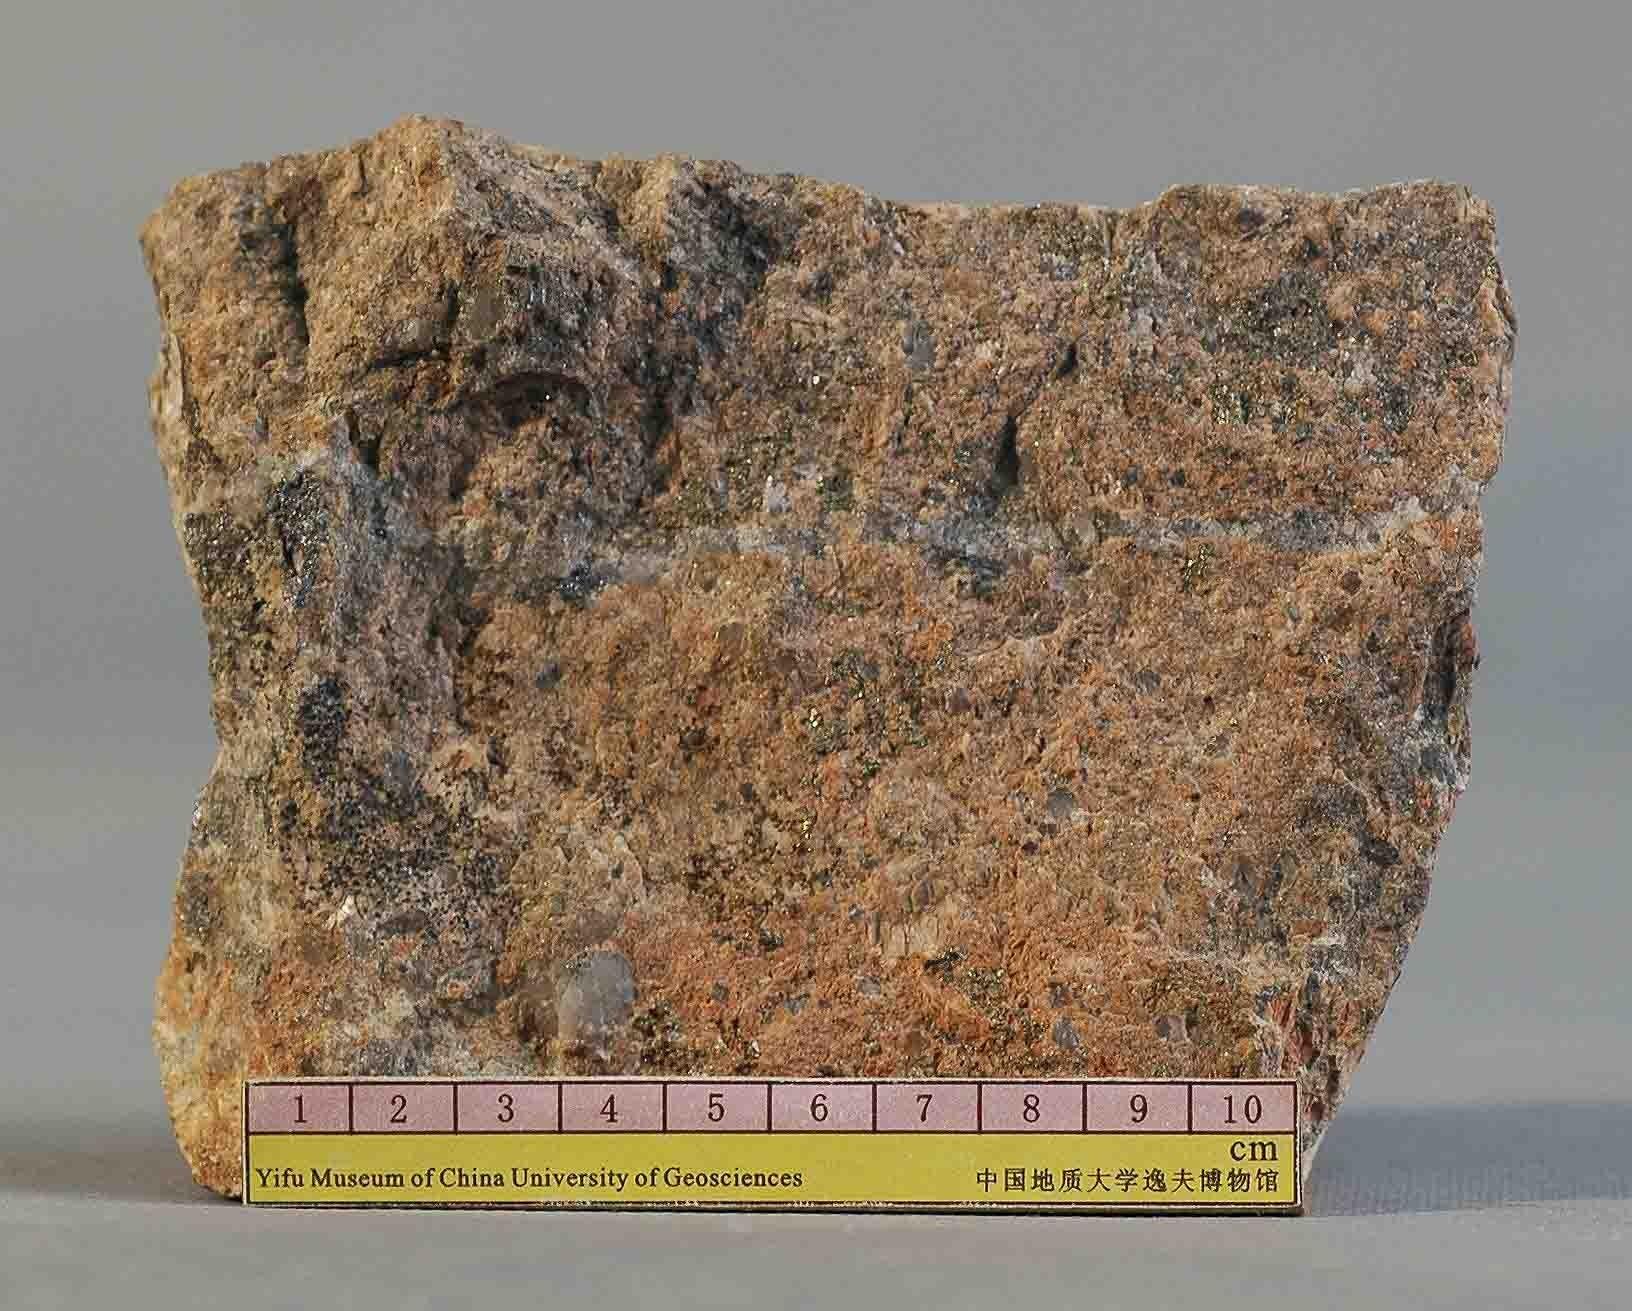 p1花岗斑岩,岩石呈肉红色,斑状结构,块状构造,斑晶主要有石英,黄铁矿